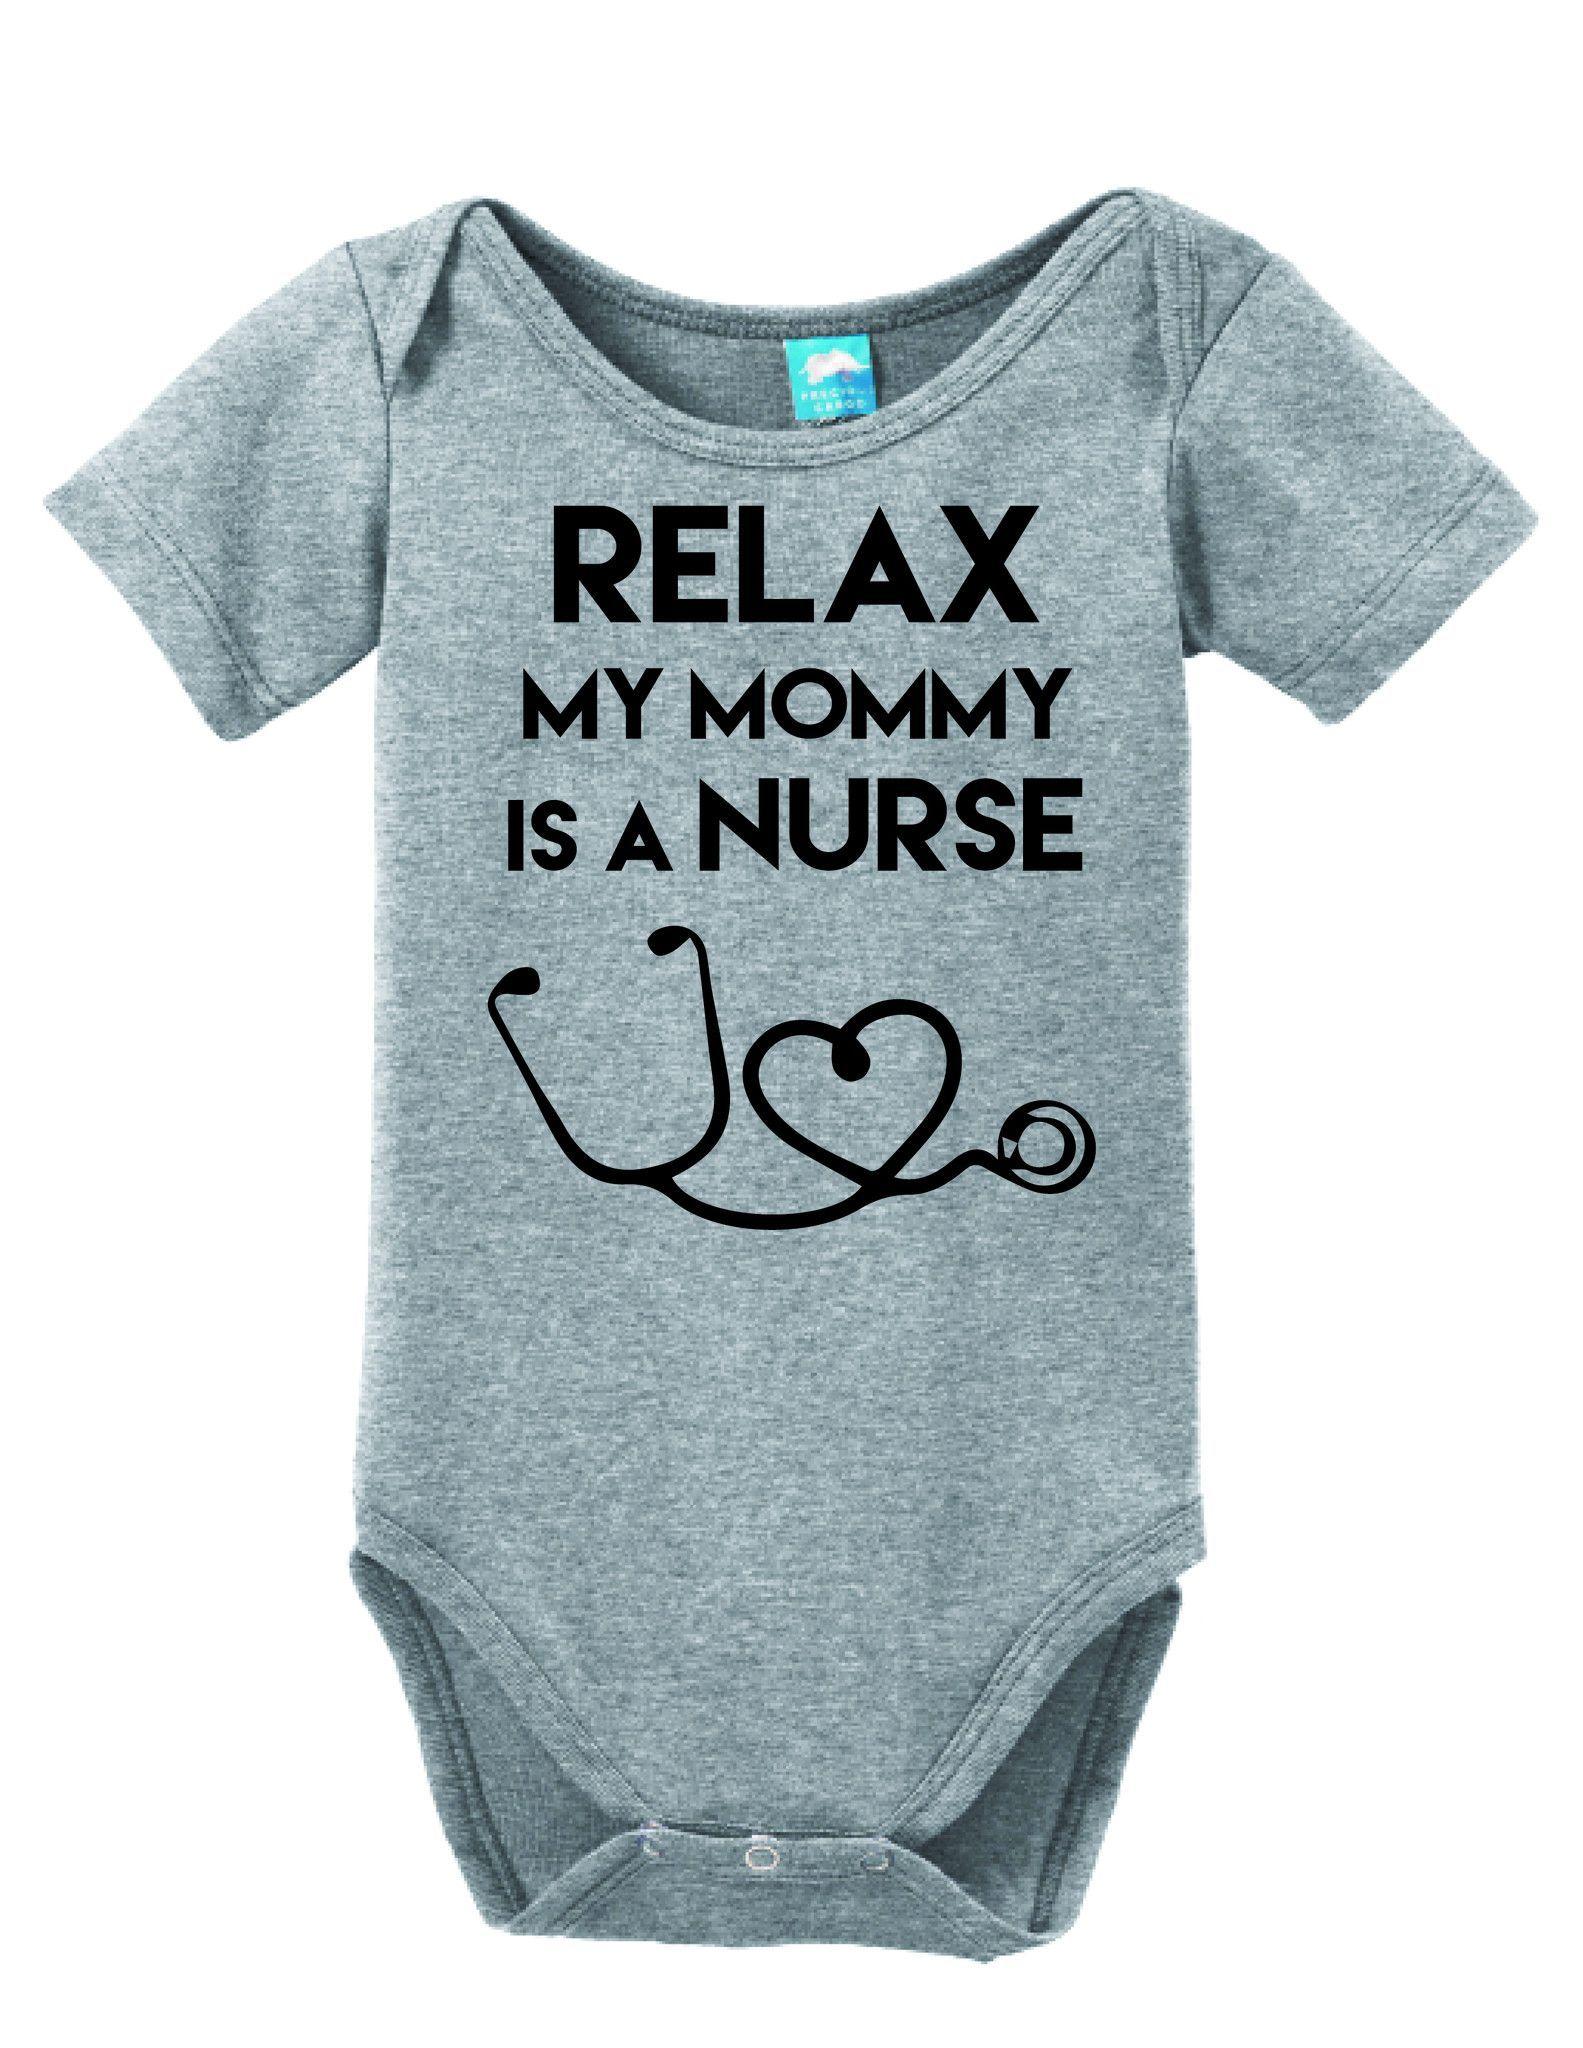 8645065e8e925 Relax My Mommy Is a Nurse Onesie Funny Bodysuit Baby Romper